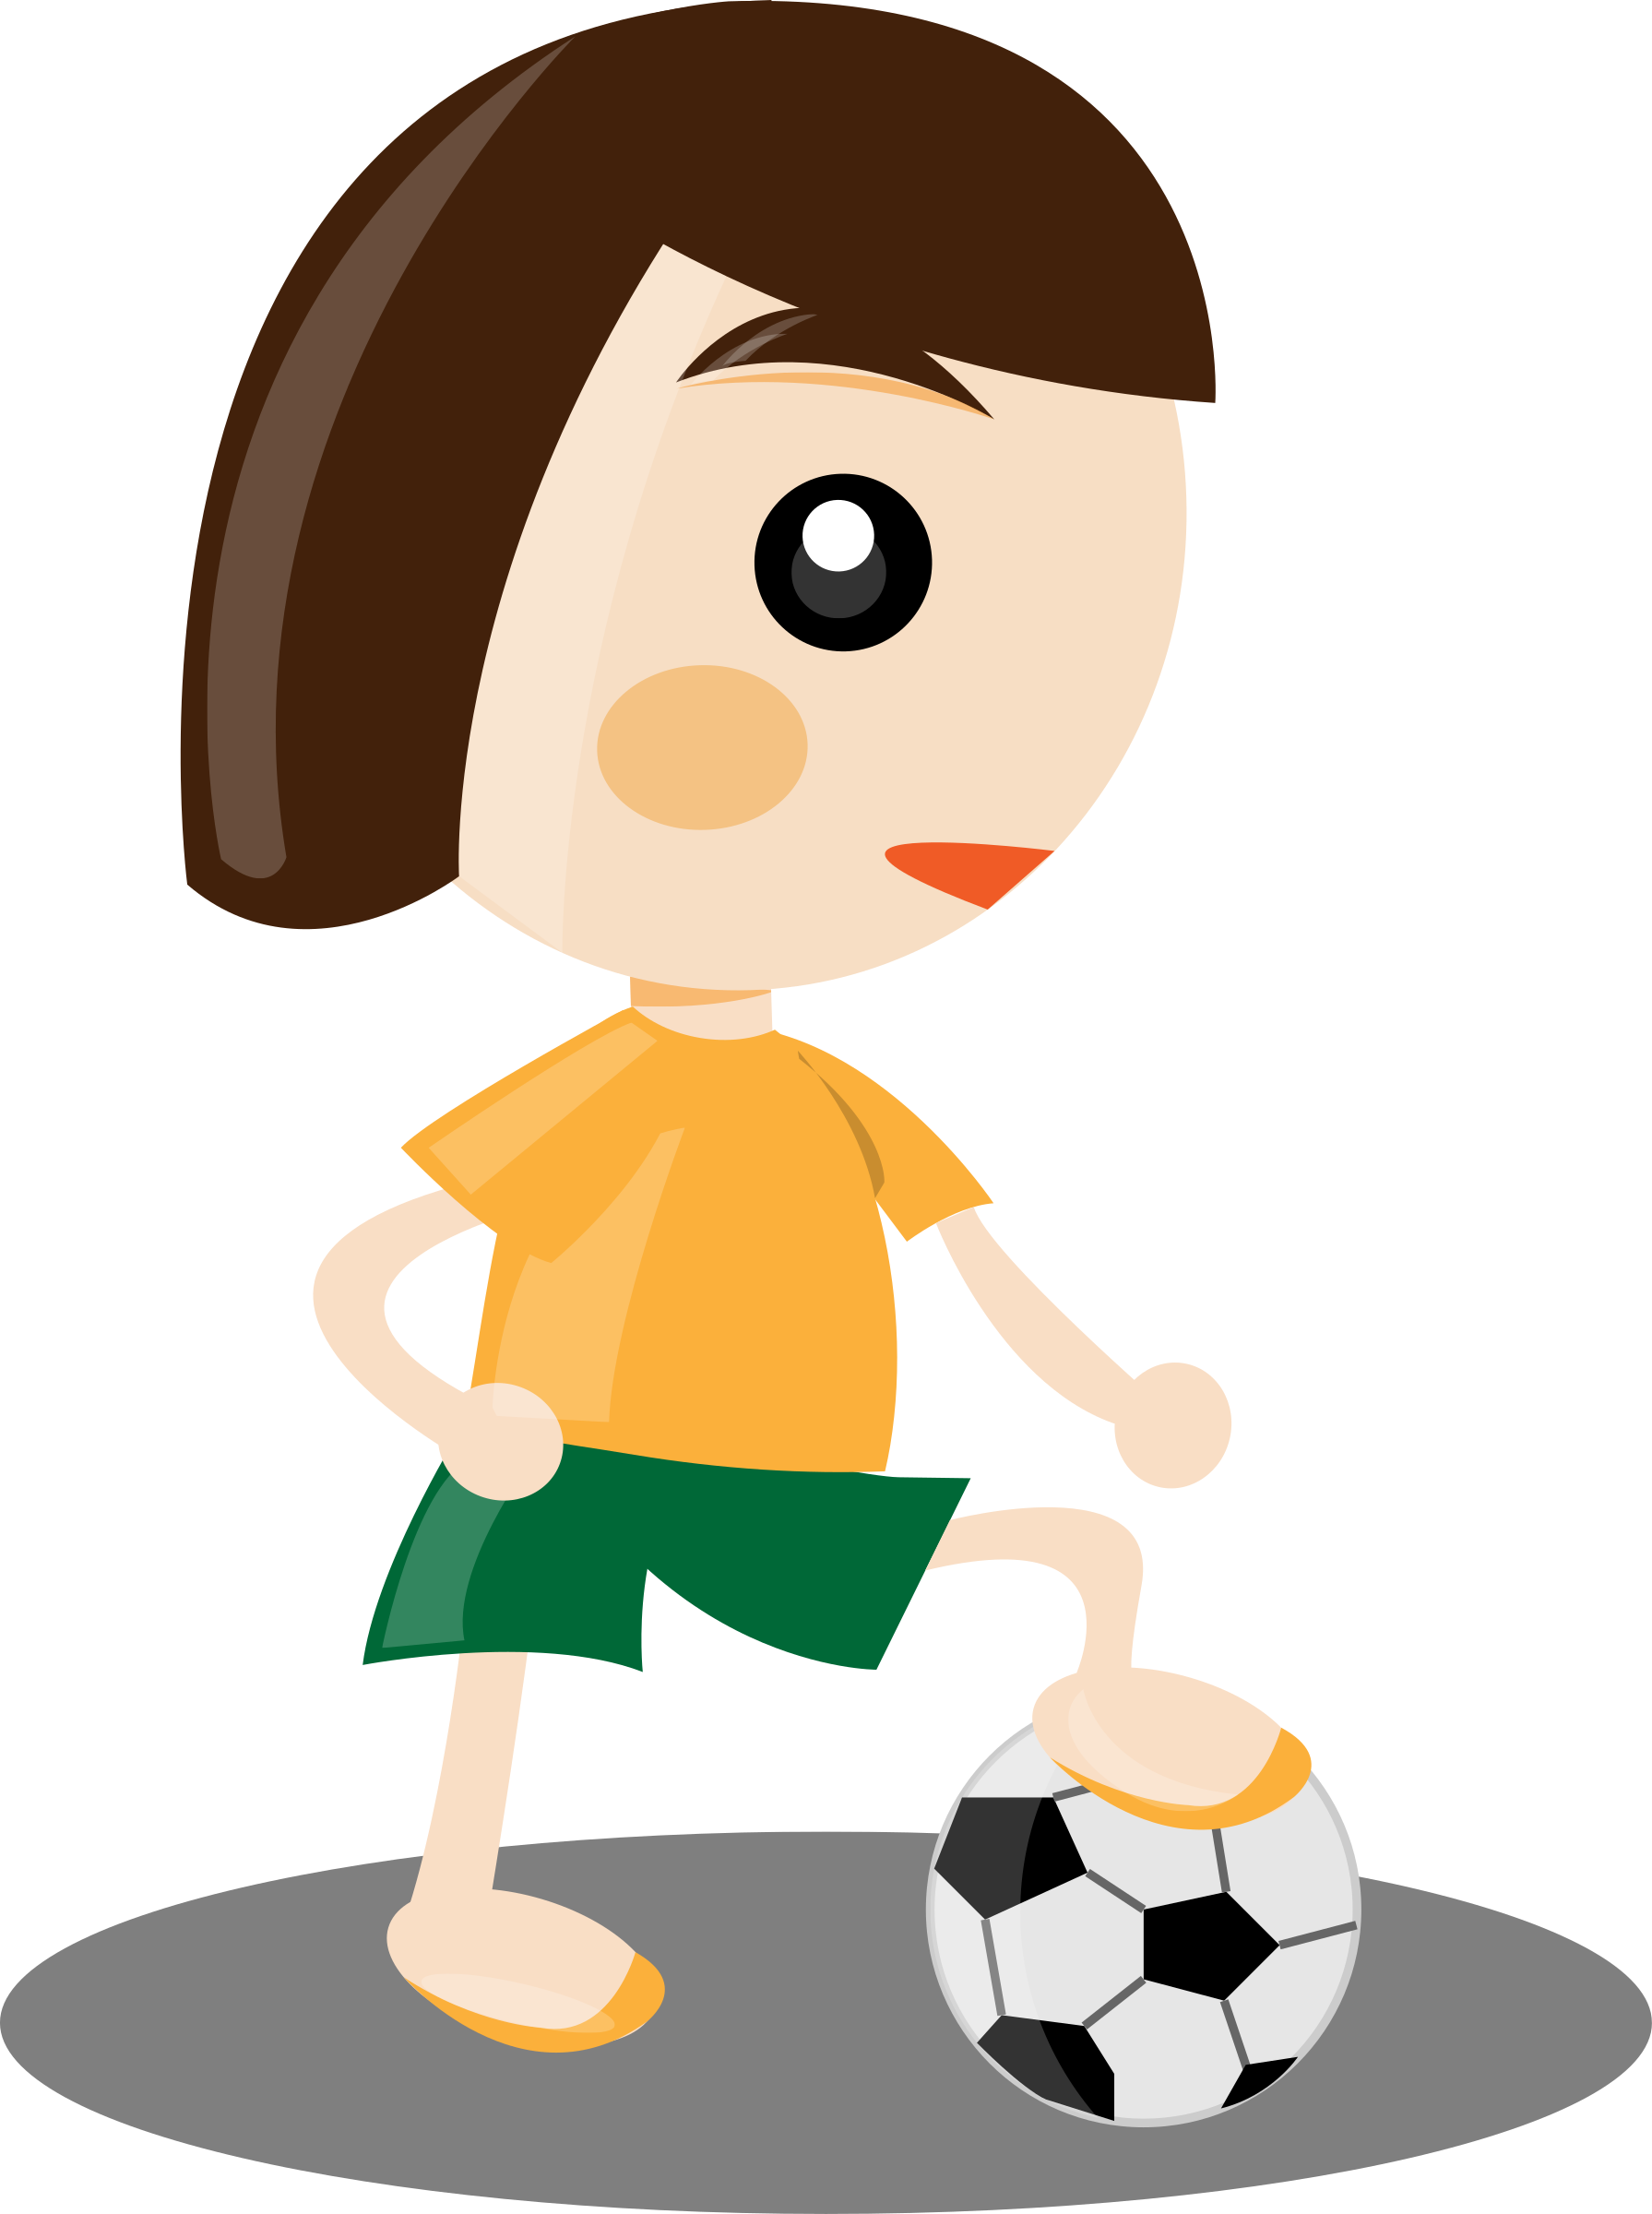 Microsoft clipart sport, Microsoft sport Transparent FREE.